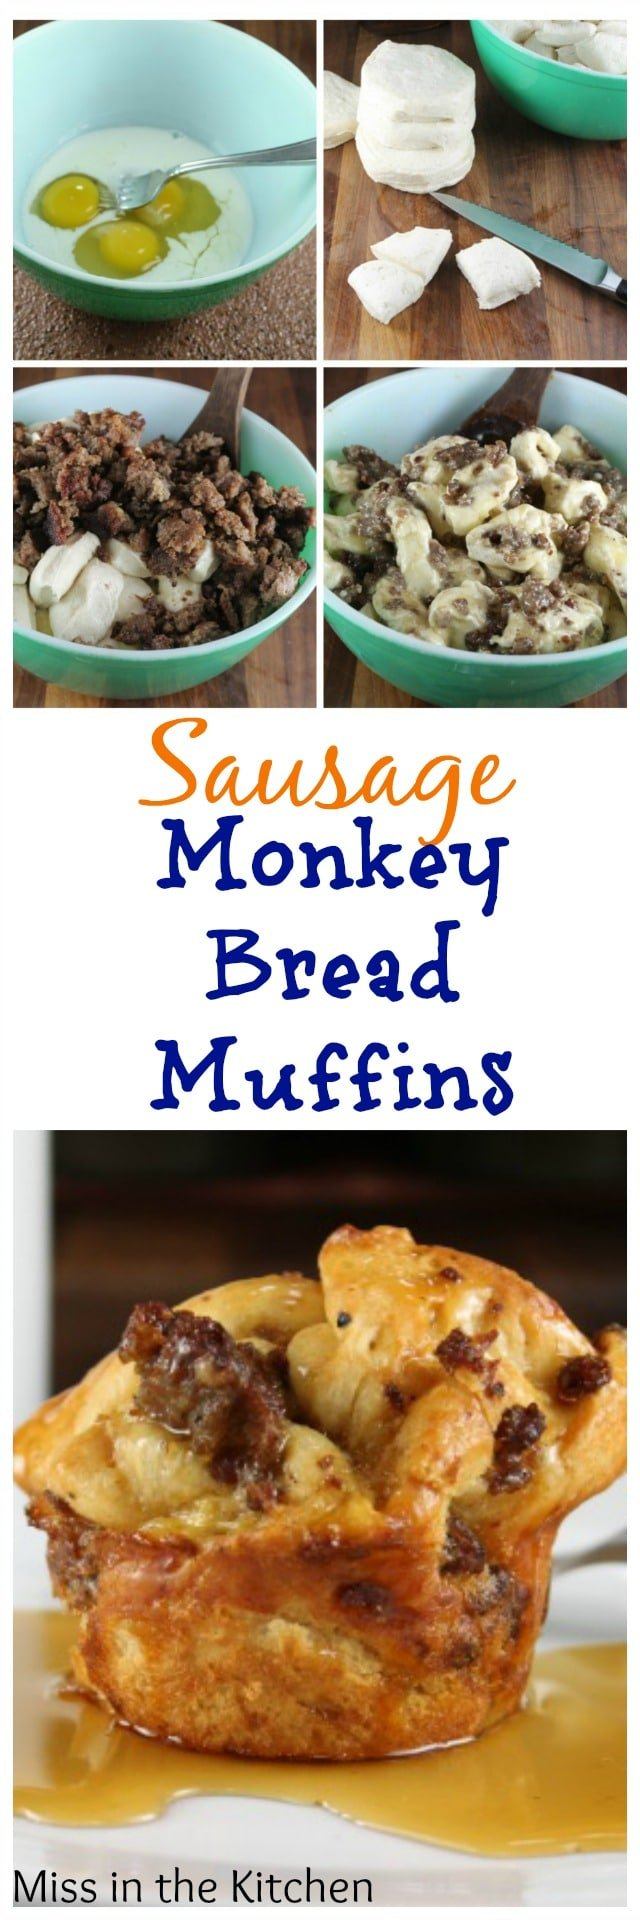 Sausage Monkey Bread Muffins Recipe from MissintheKitchen.com